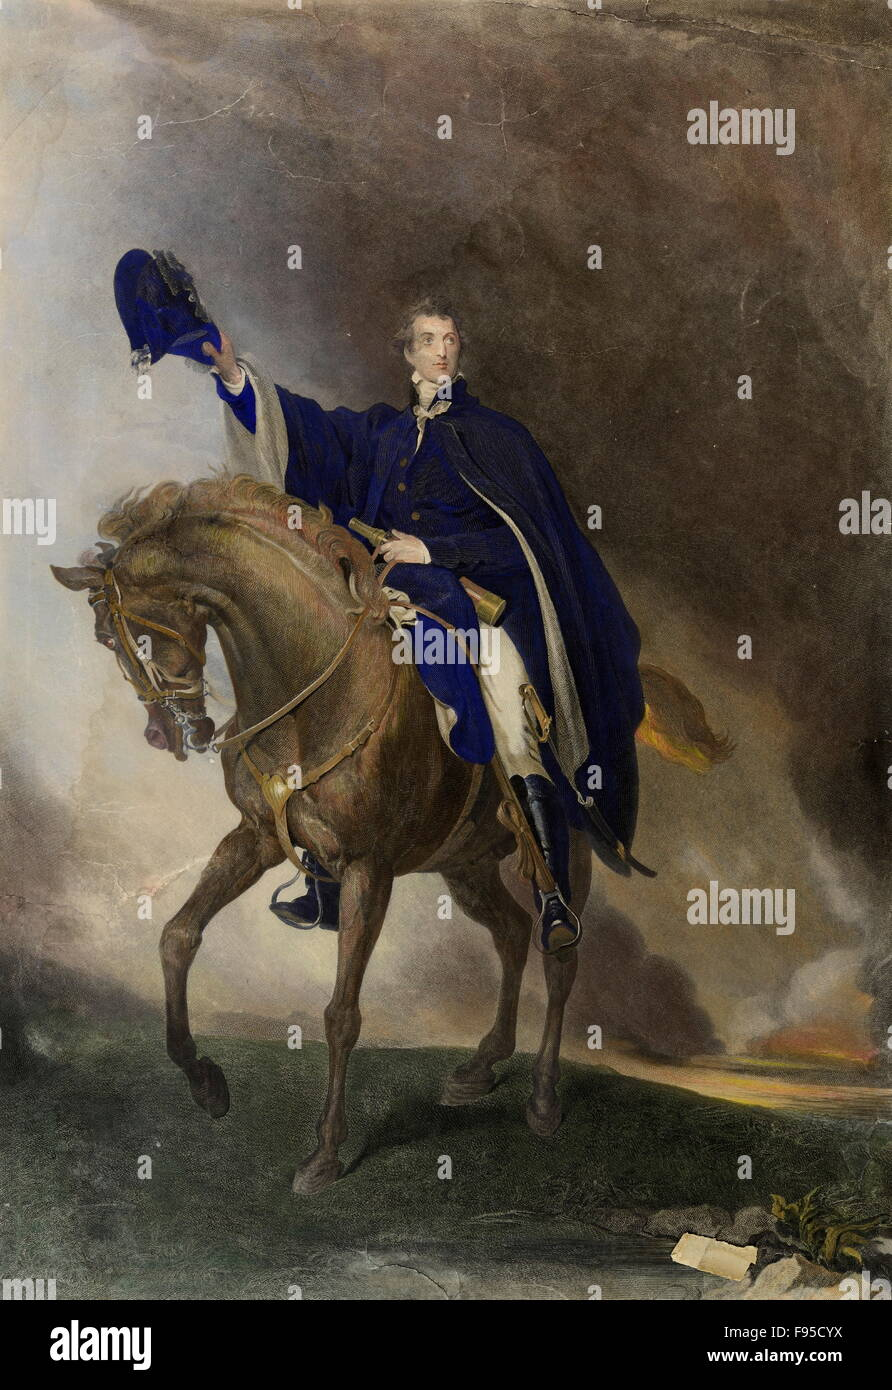 The Duke of Wellington. - Stock Image